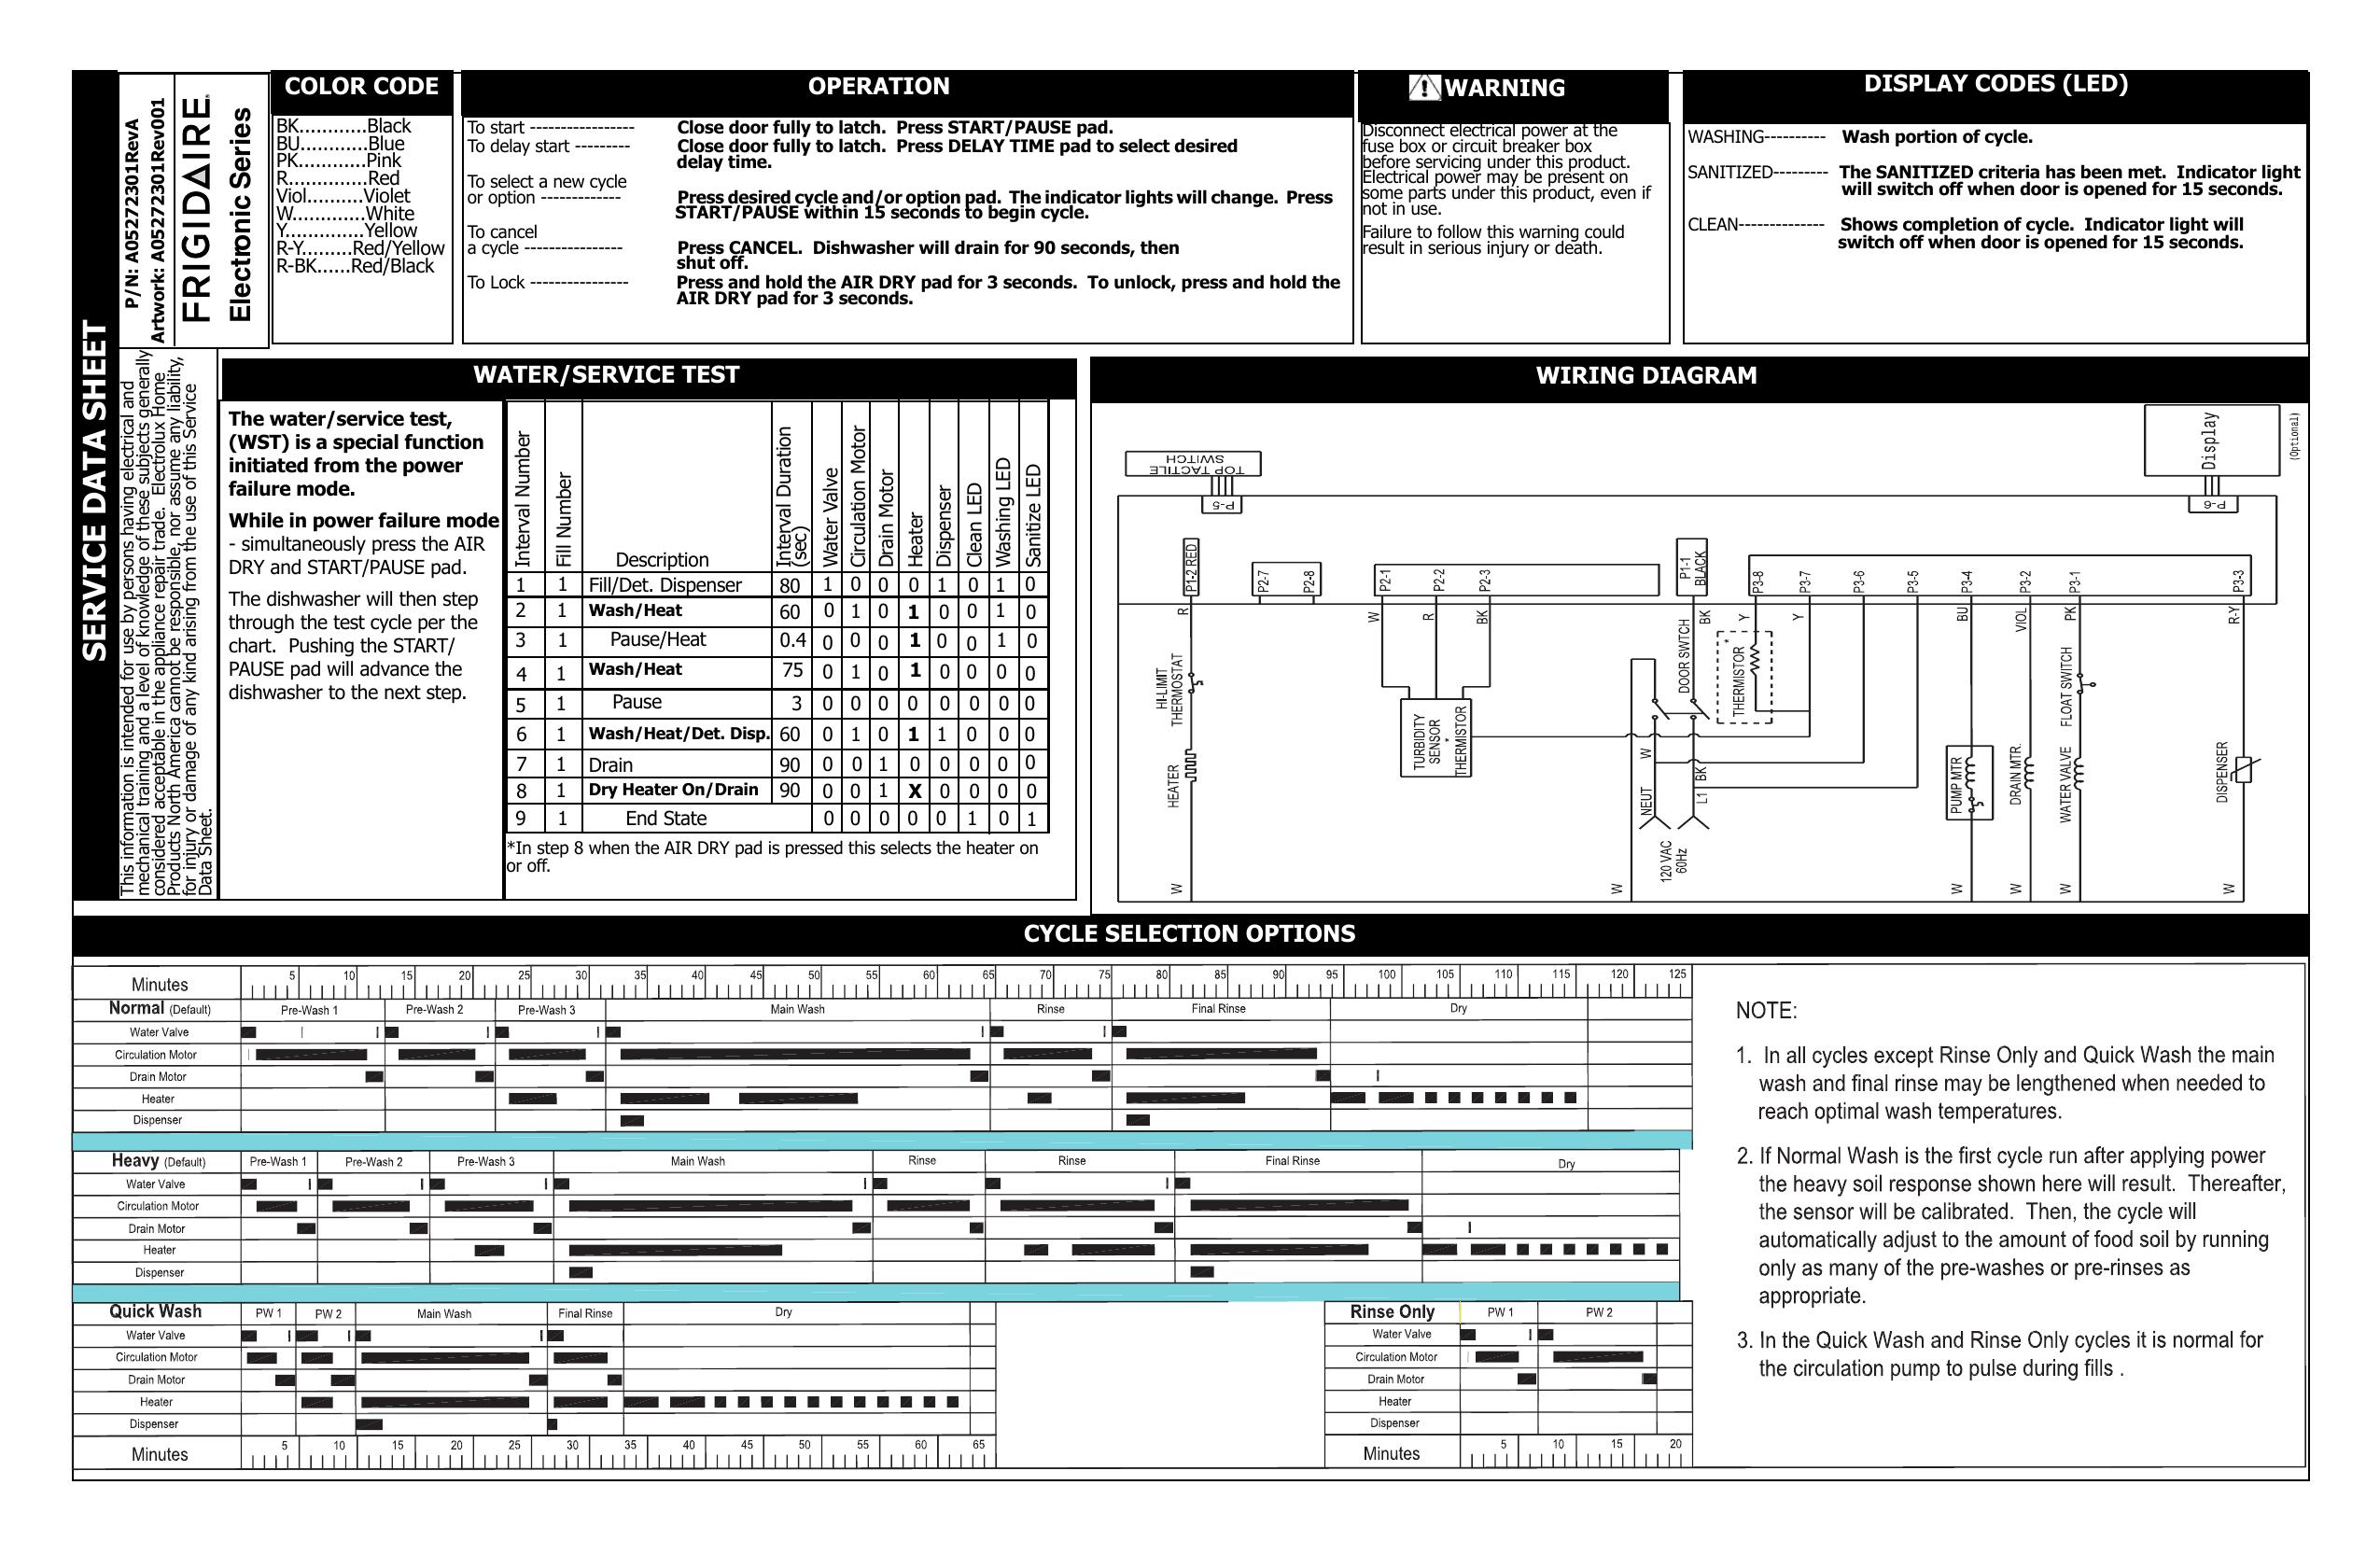 frigidaire valve wiring diagram frigidaire fgcd2444sb wiring diagram manualzz  frigidaire fgcd2444sb wiring diagram